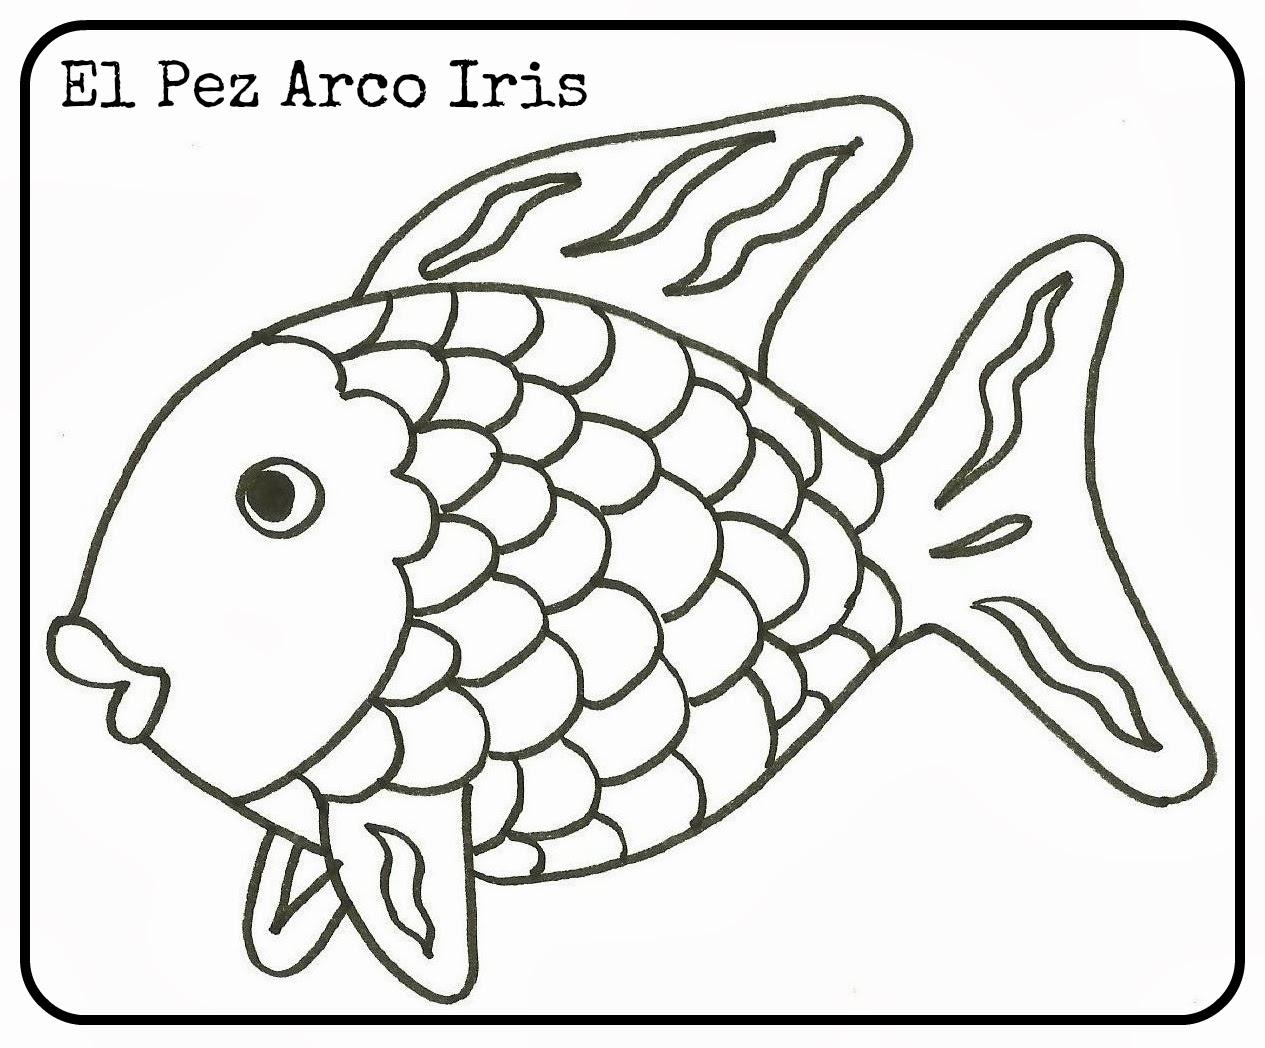 EN EL FONDO DEL MAR : El pez arco iris (Marcus Pfister) » La magia ...